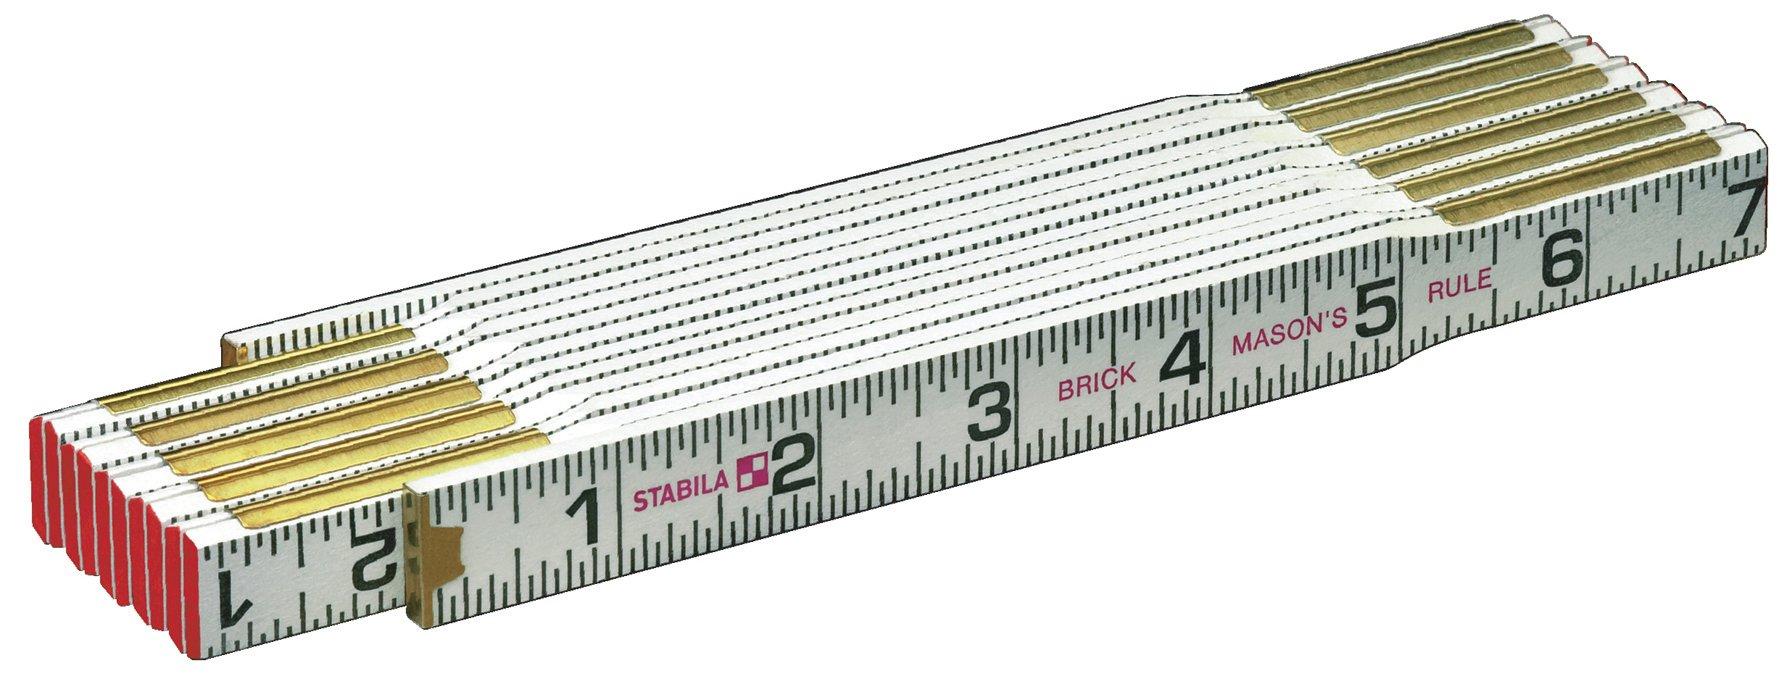 Stabila 80001 Type 600 Mason's (1/16ths - Both Edges - Outside) Folding Rules